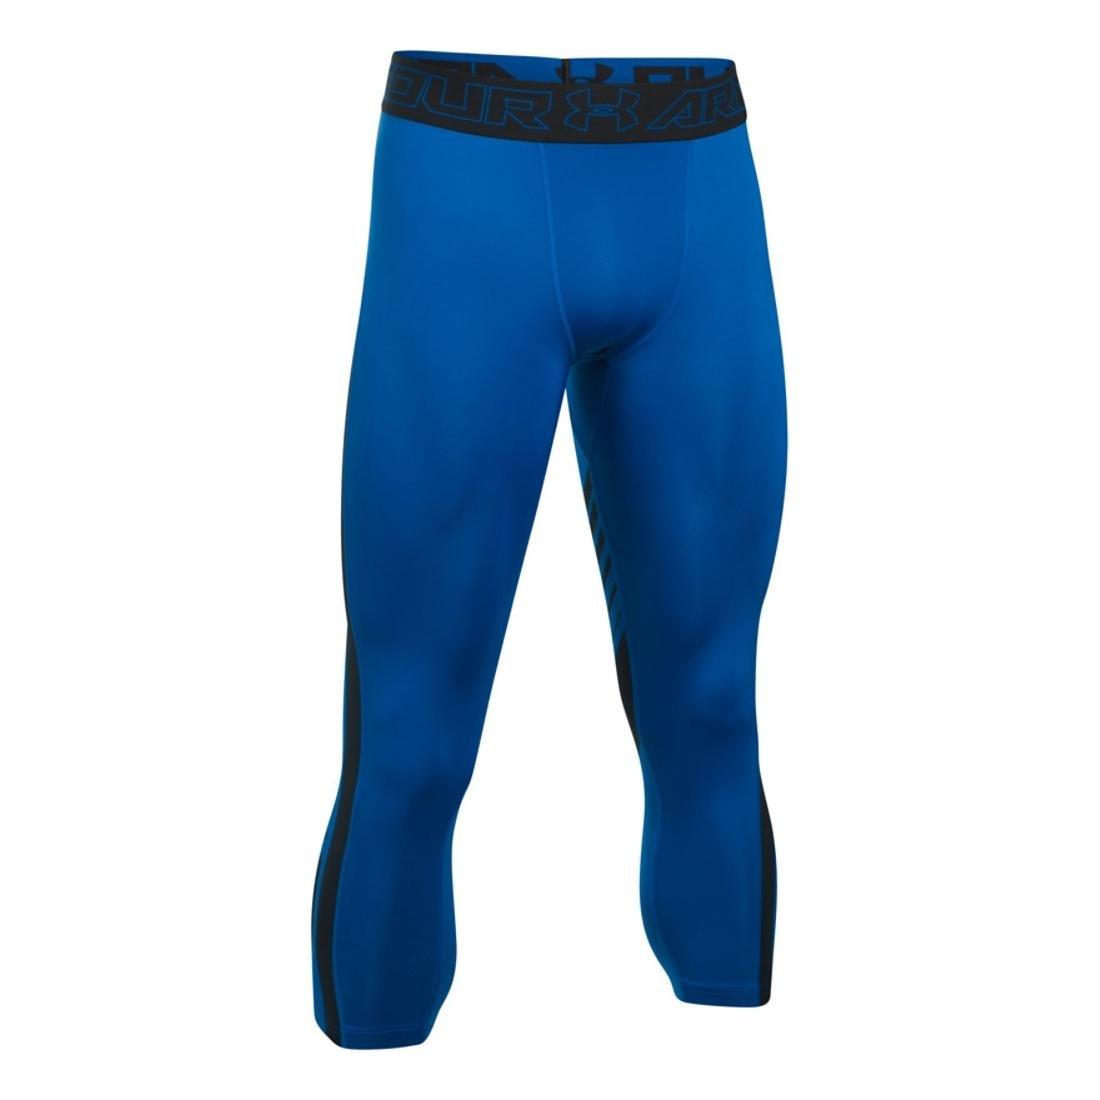 Under Armour Men's HeatGear Supervent 2.0 3/4 Legging, Blue Marker, XX-Large